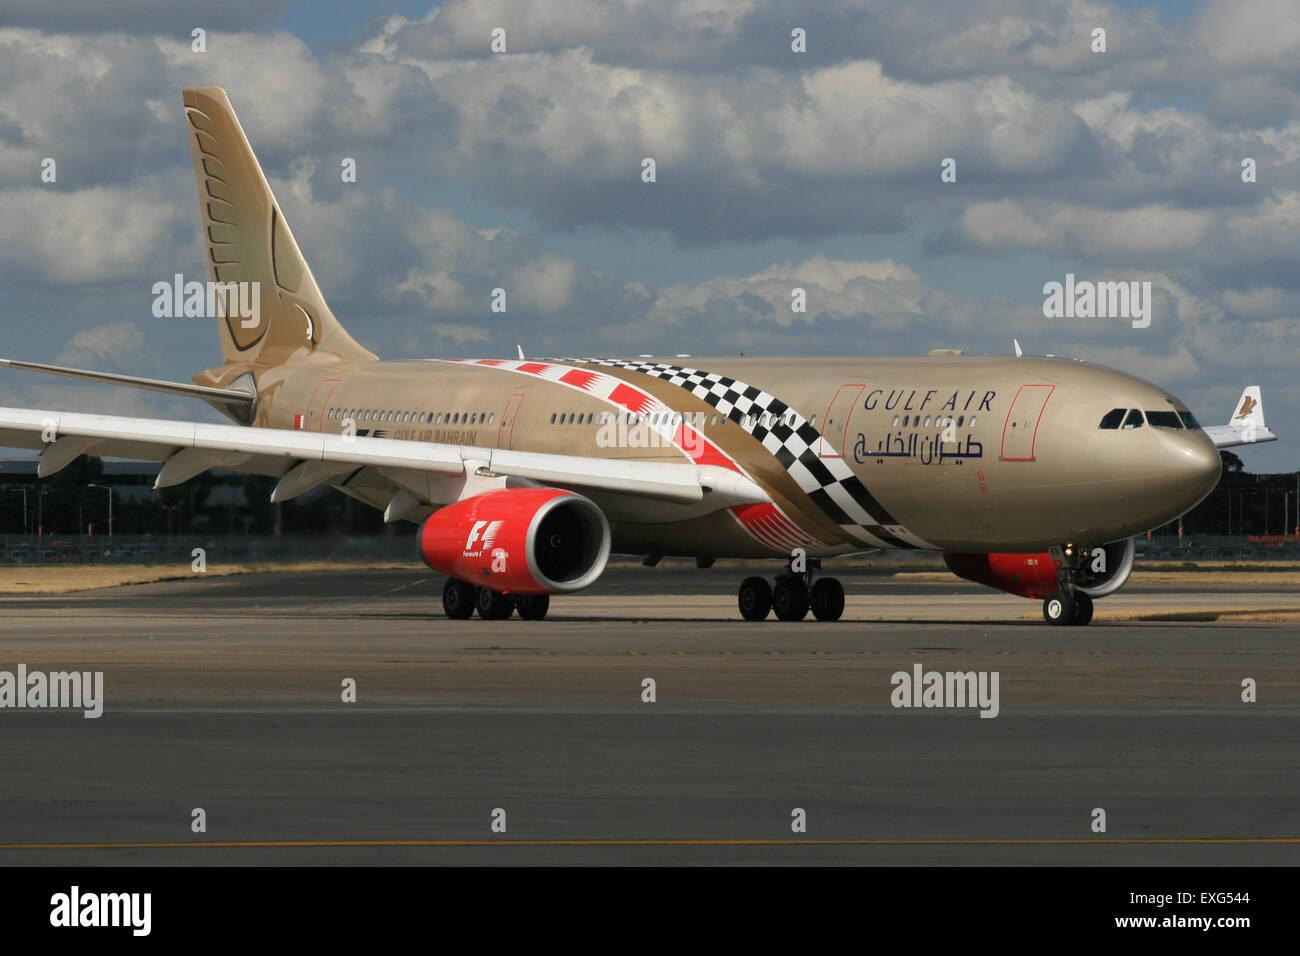 GULF AIR A330 GRAND PRIX FORMULA ONE COLOURS - Stock Image